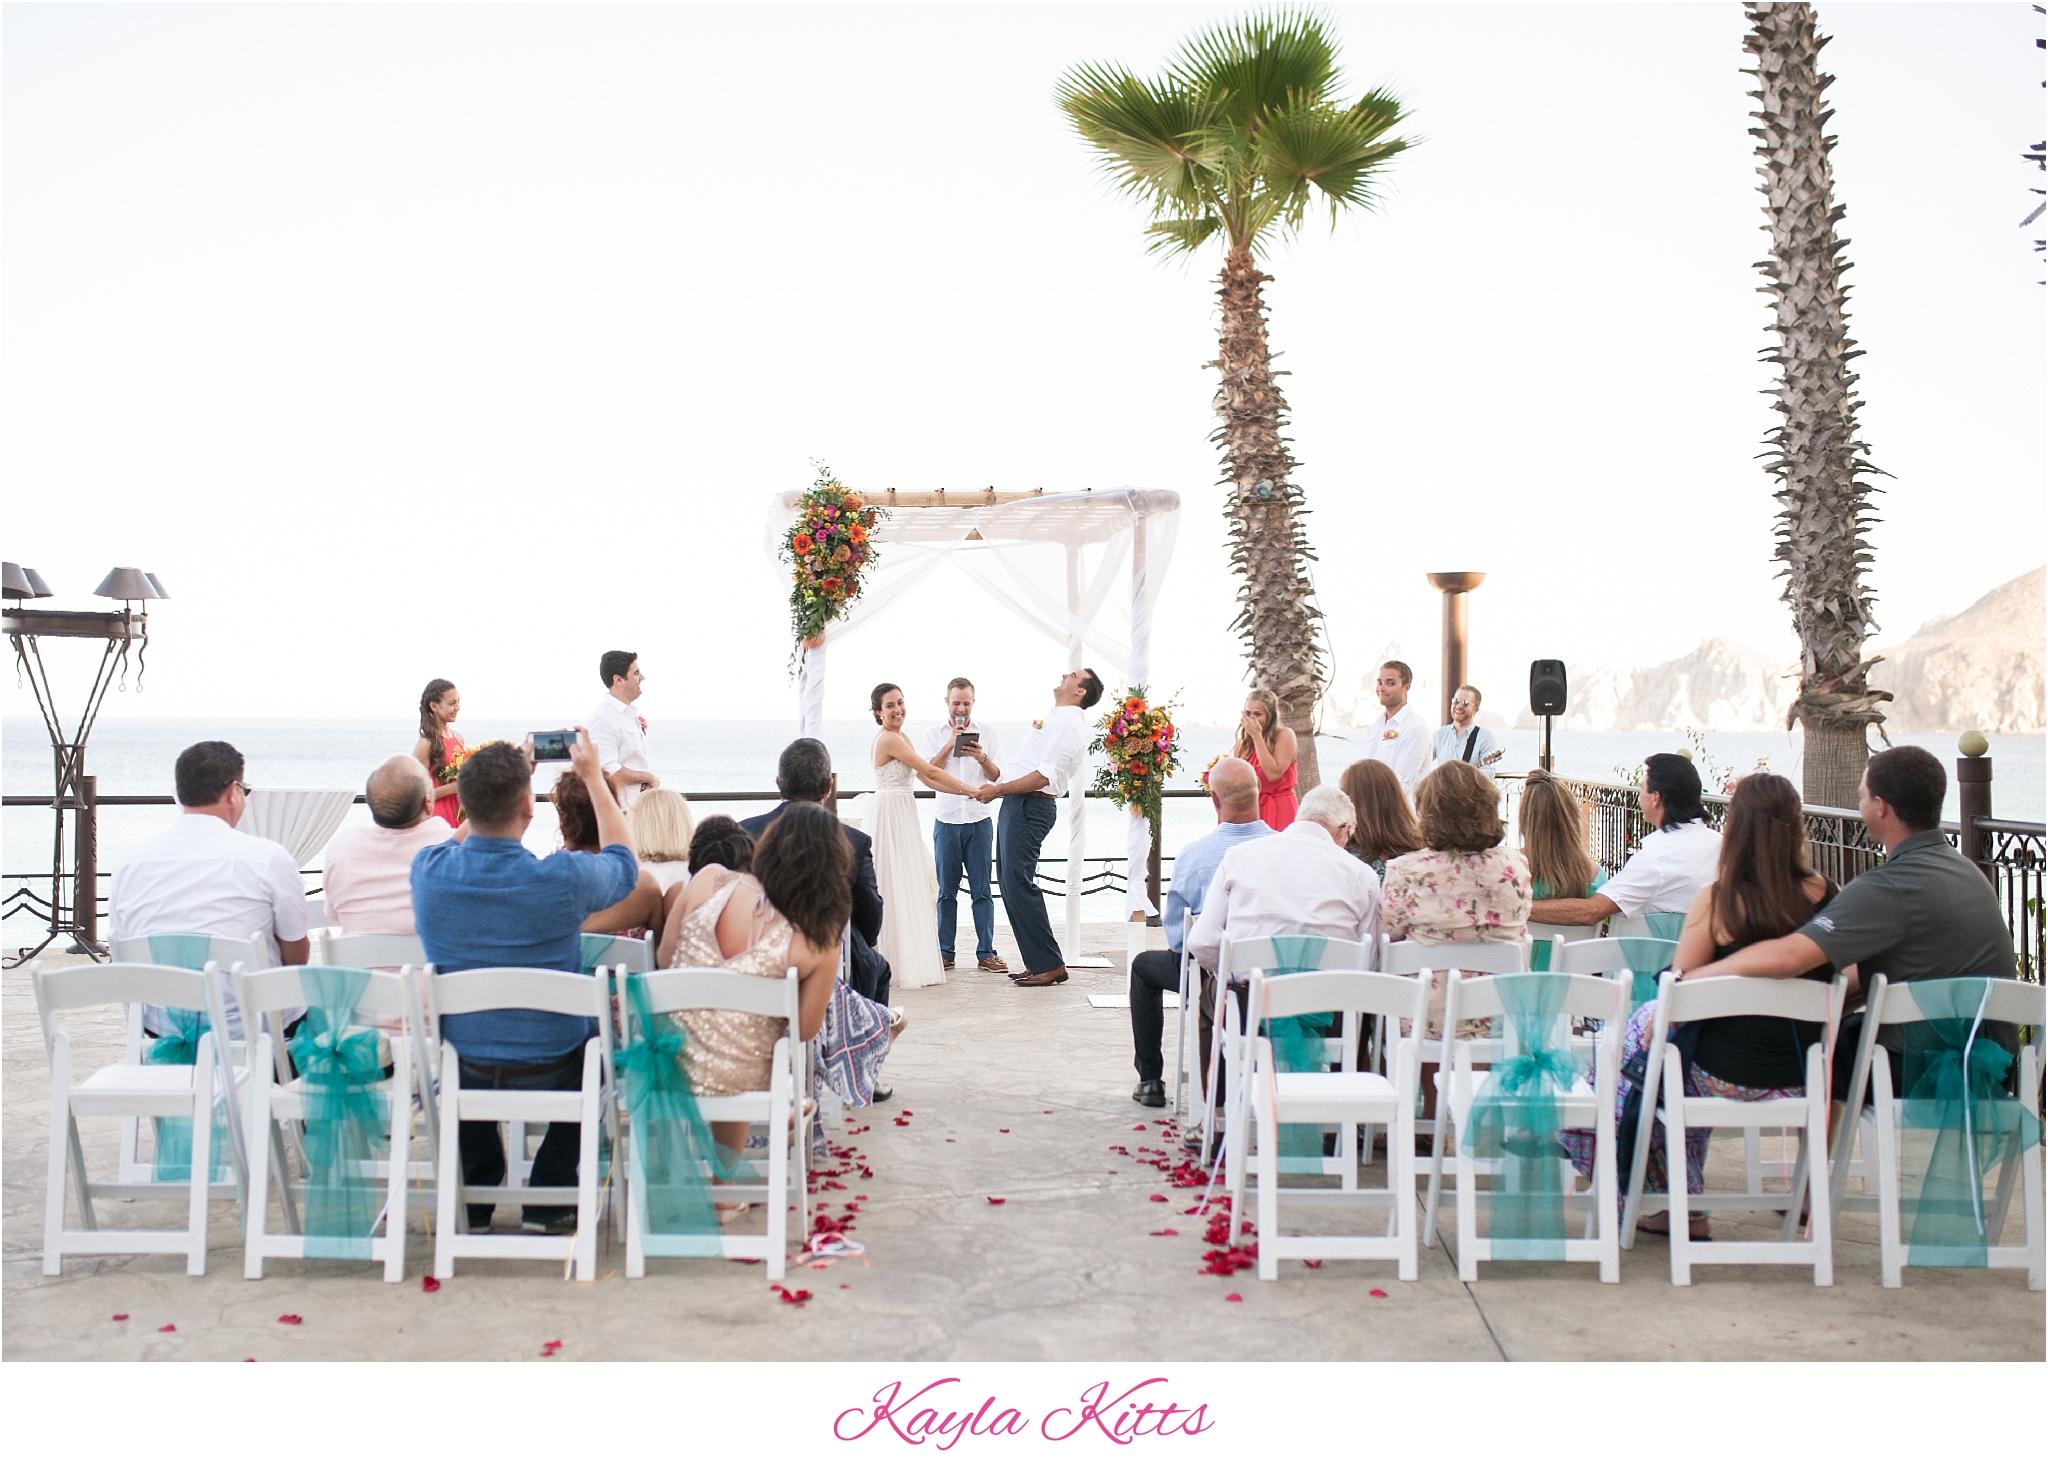 kayla kitts photography-travis and sarah-cabo wedding-cabo wedding photographer-destination wedding photographer-paris wedding photographer-albuquerque wedding-matt jones-albuquerque wedding vendor-intimate wedding_0016.jpg